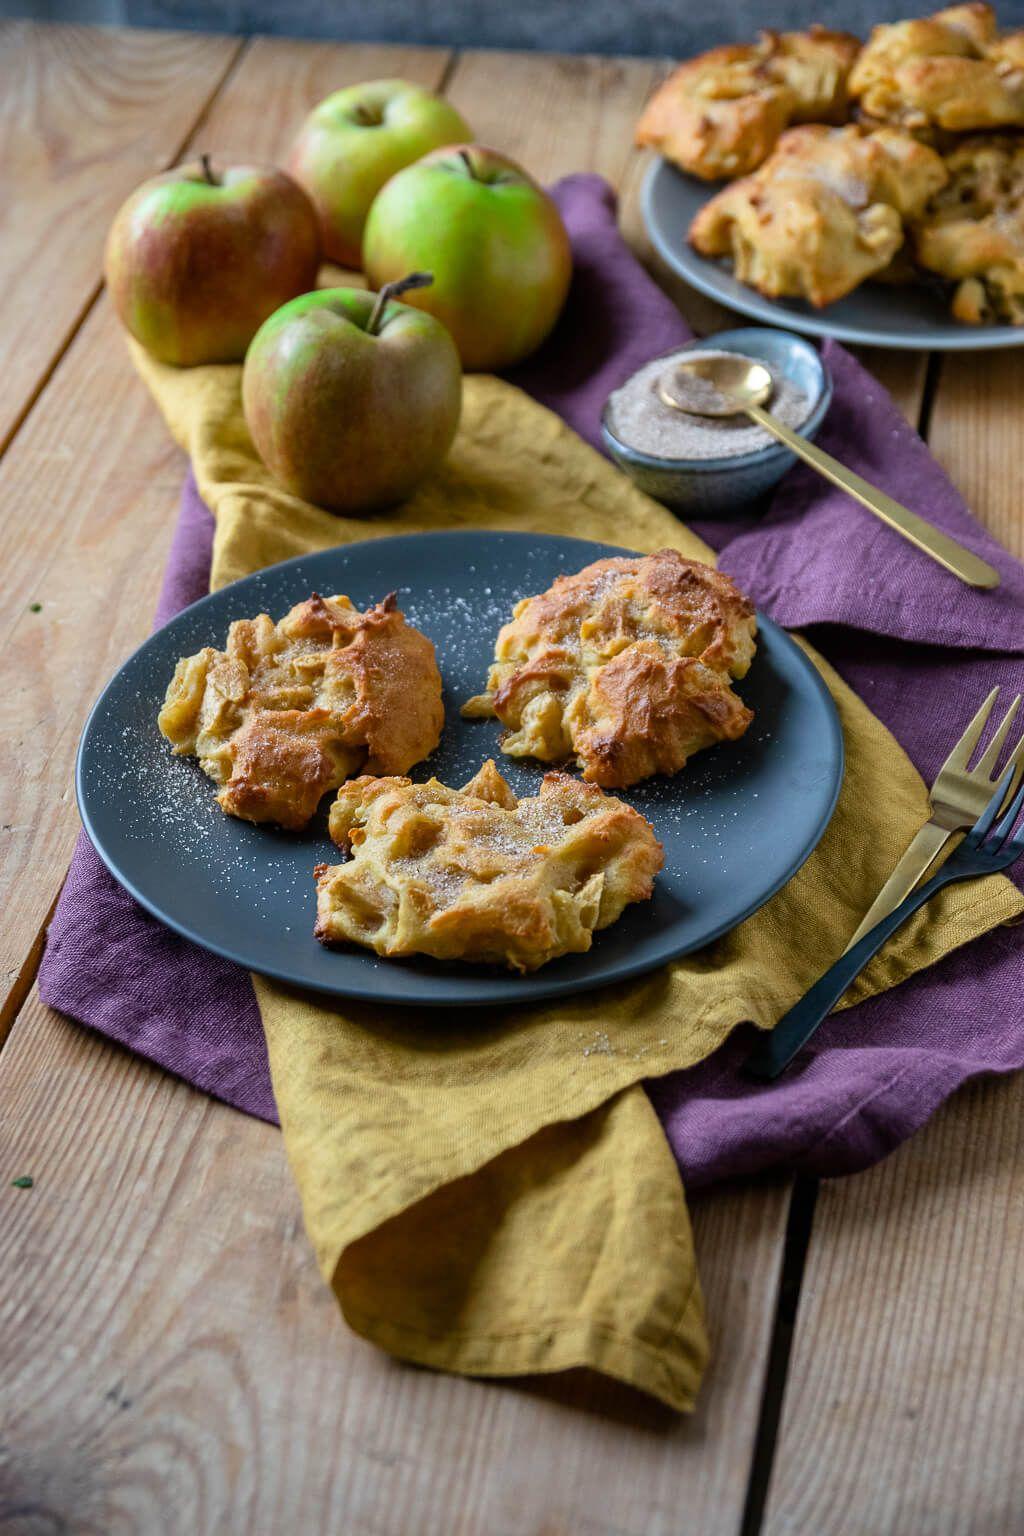 Saftige Apfel Zimt Taler Einfach Malene Rezept Apfel Zimt Kuchen Lebensmittel Essen Kekse Backen Rezept